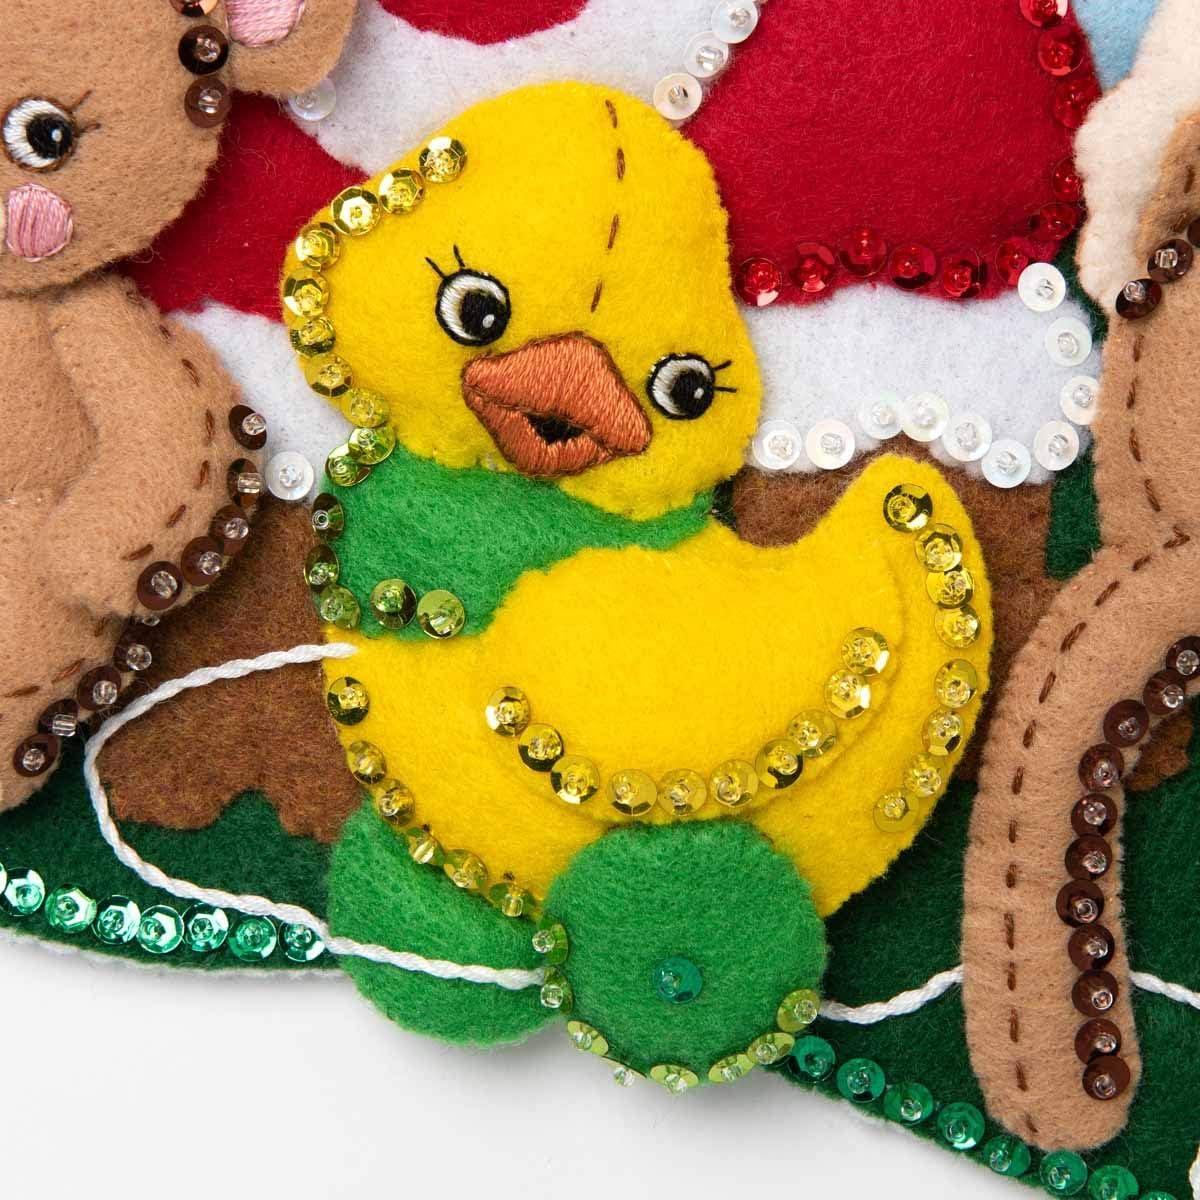 18 Bucilla 89229E Felt Applique Christmas Stocking Kit Toys from Santa